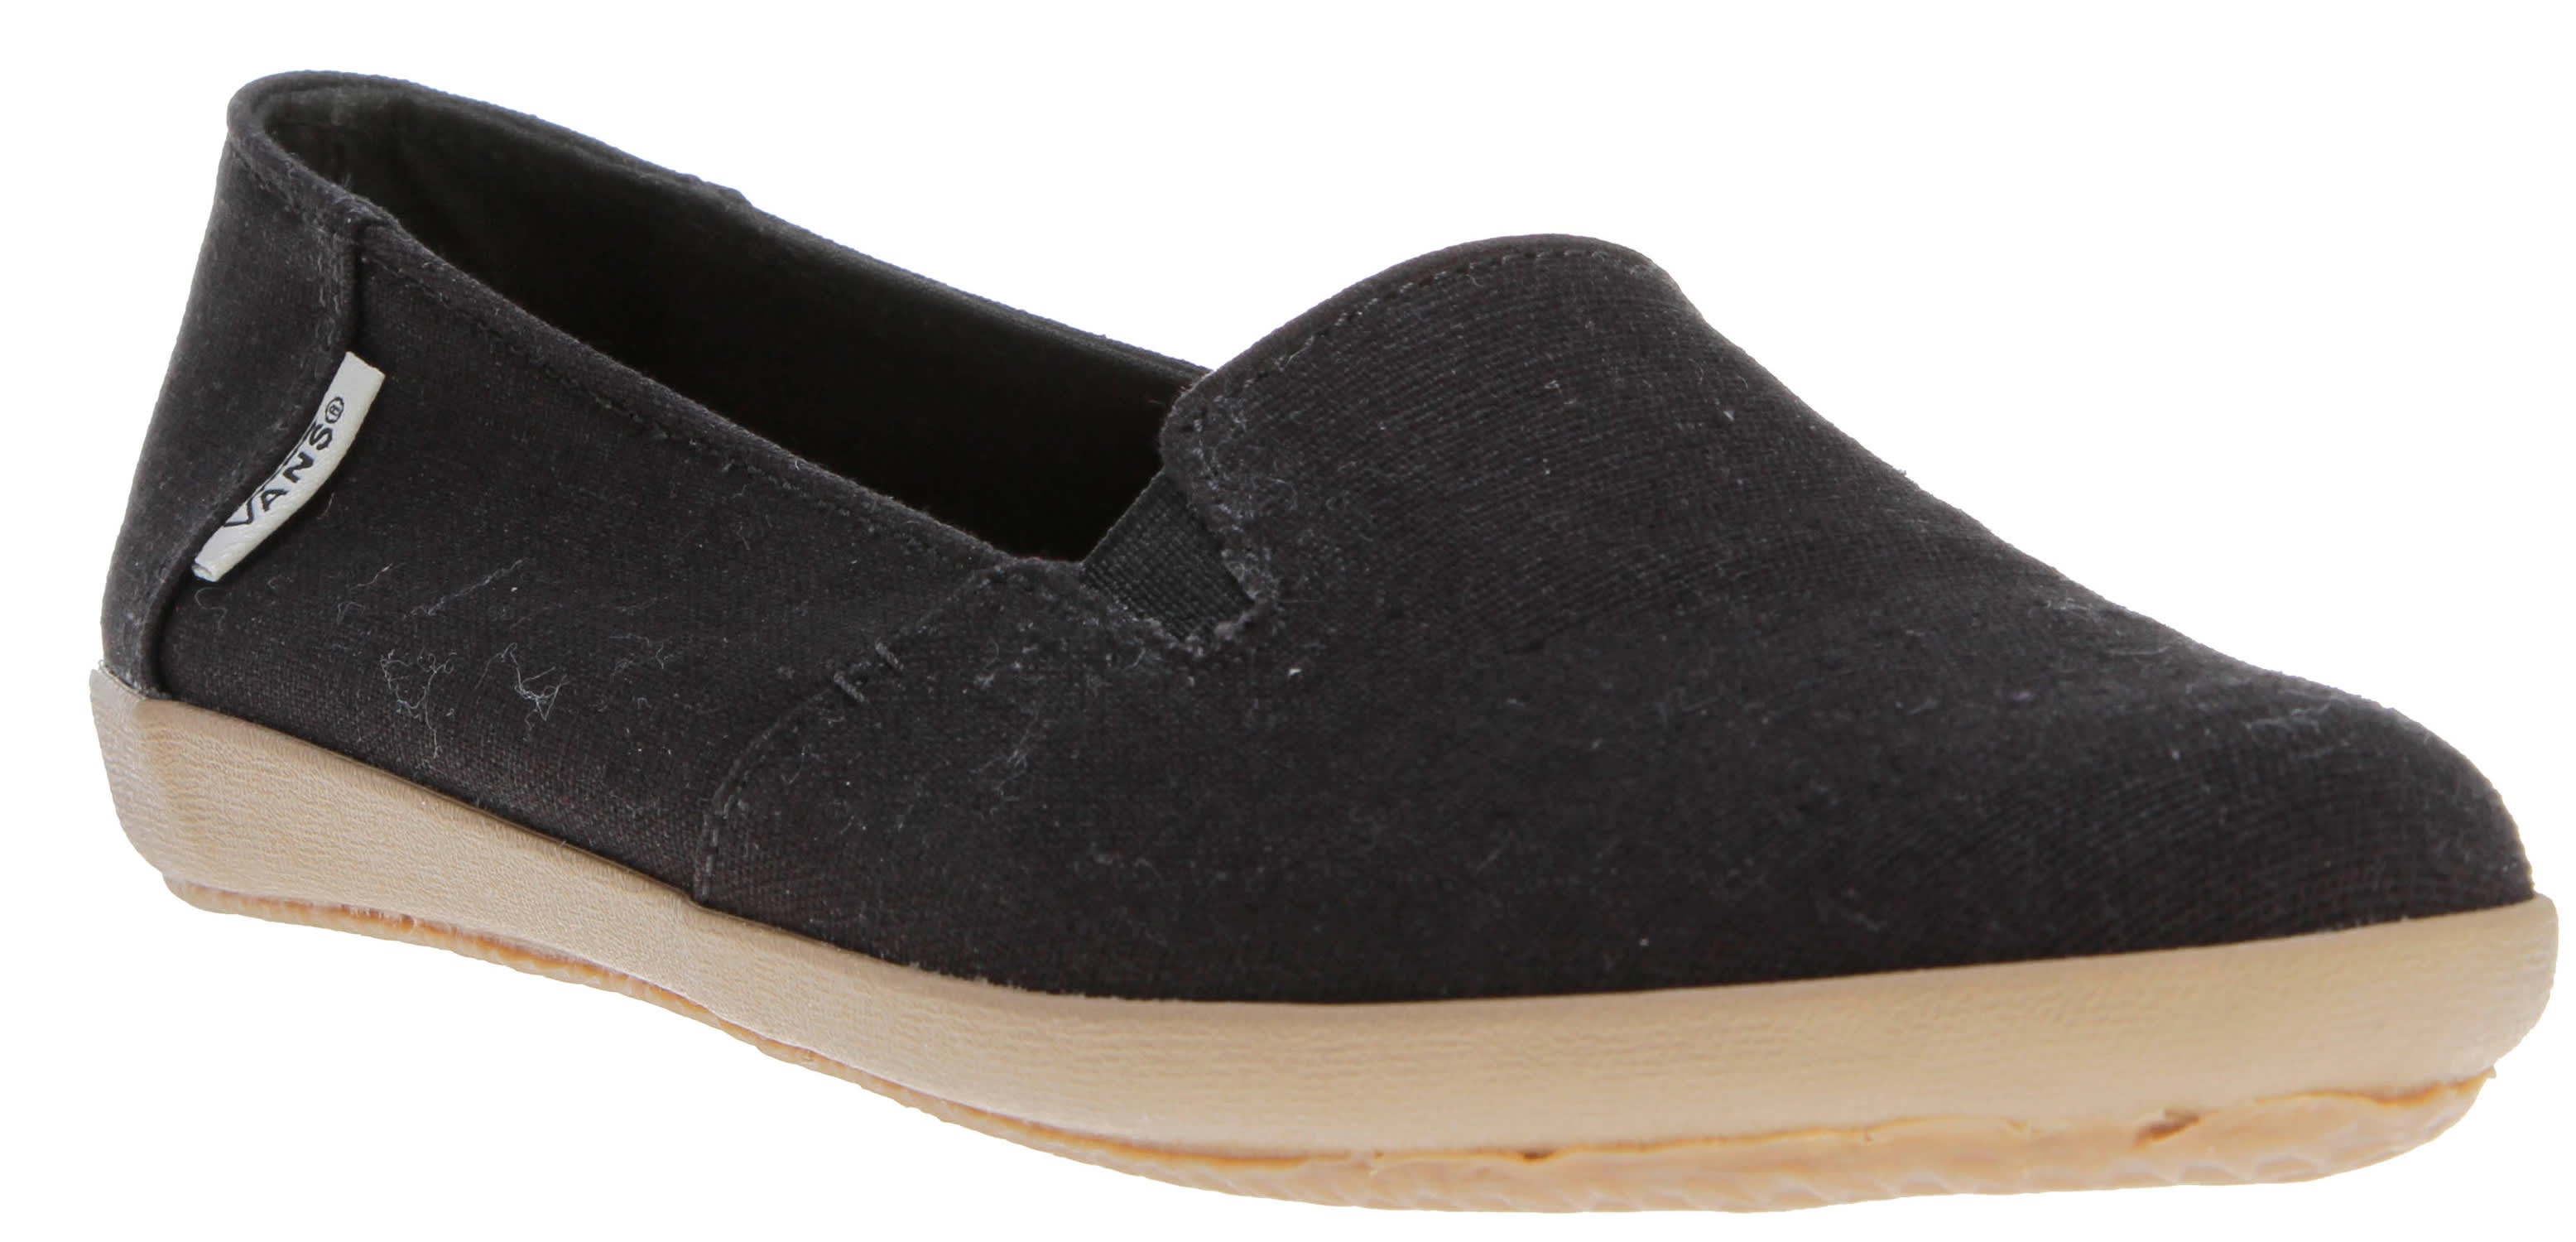 a597263307 Vans Bixie Shoes - thumbnail 2